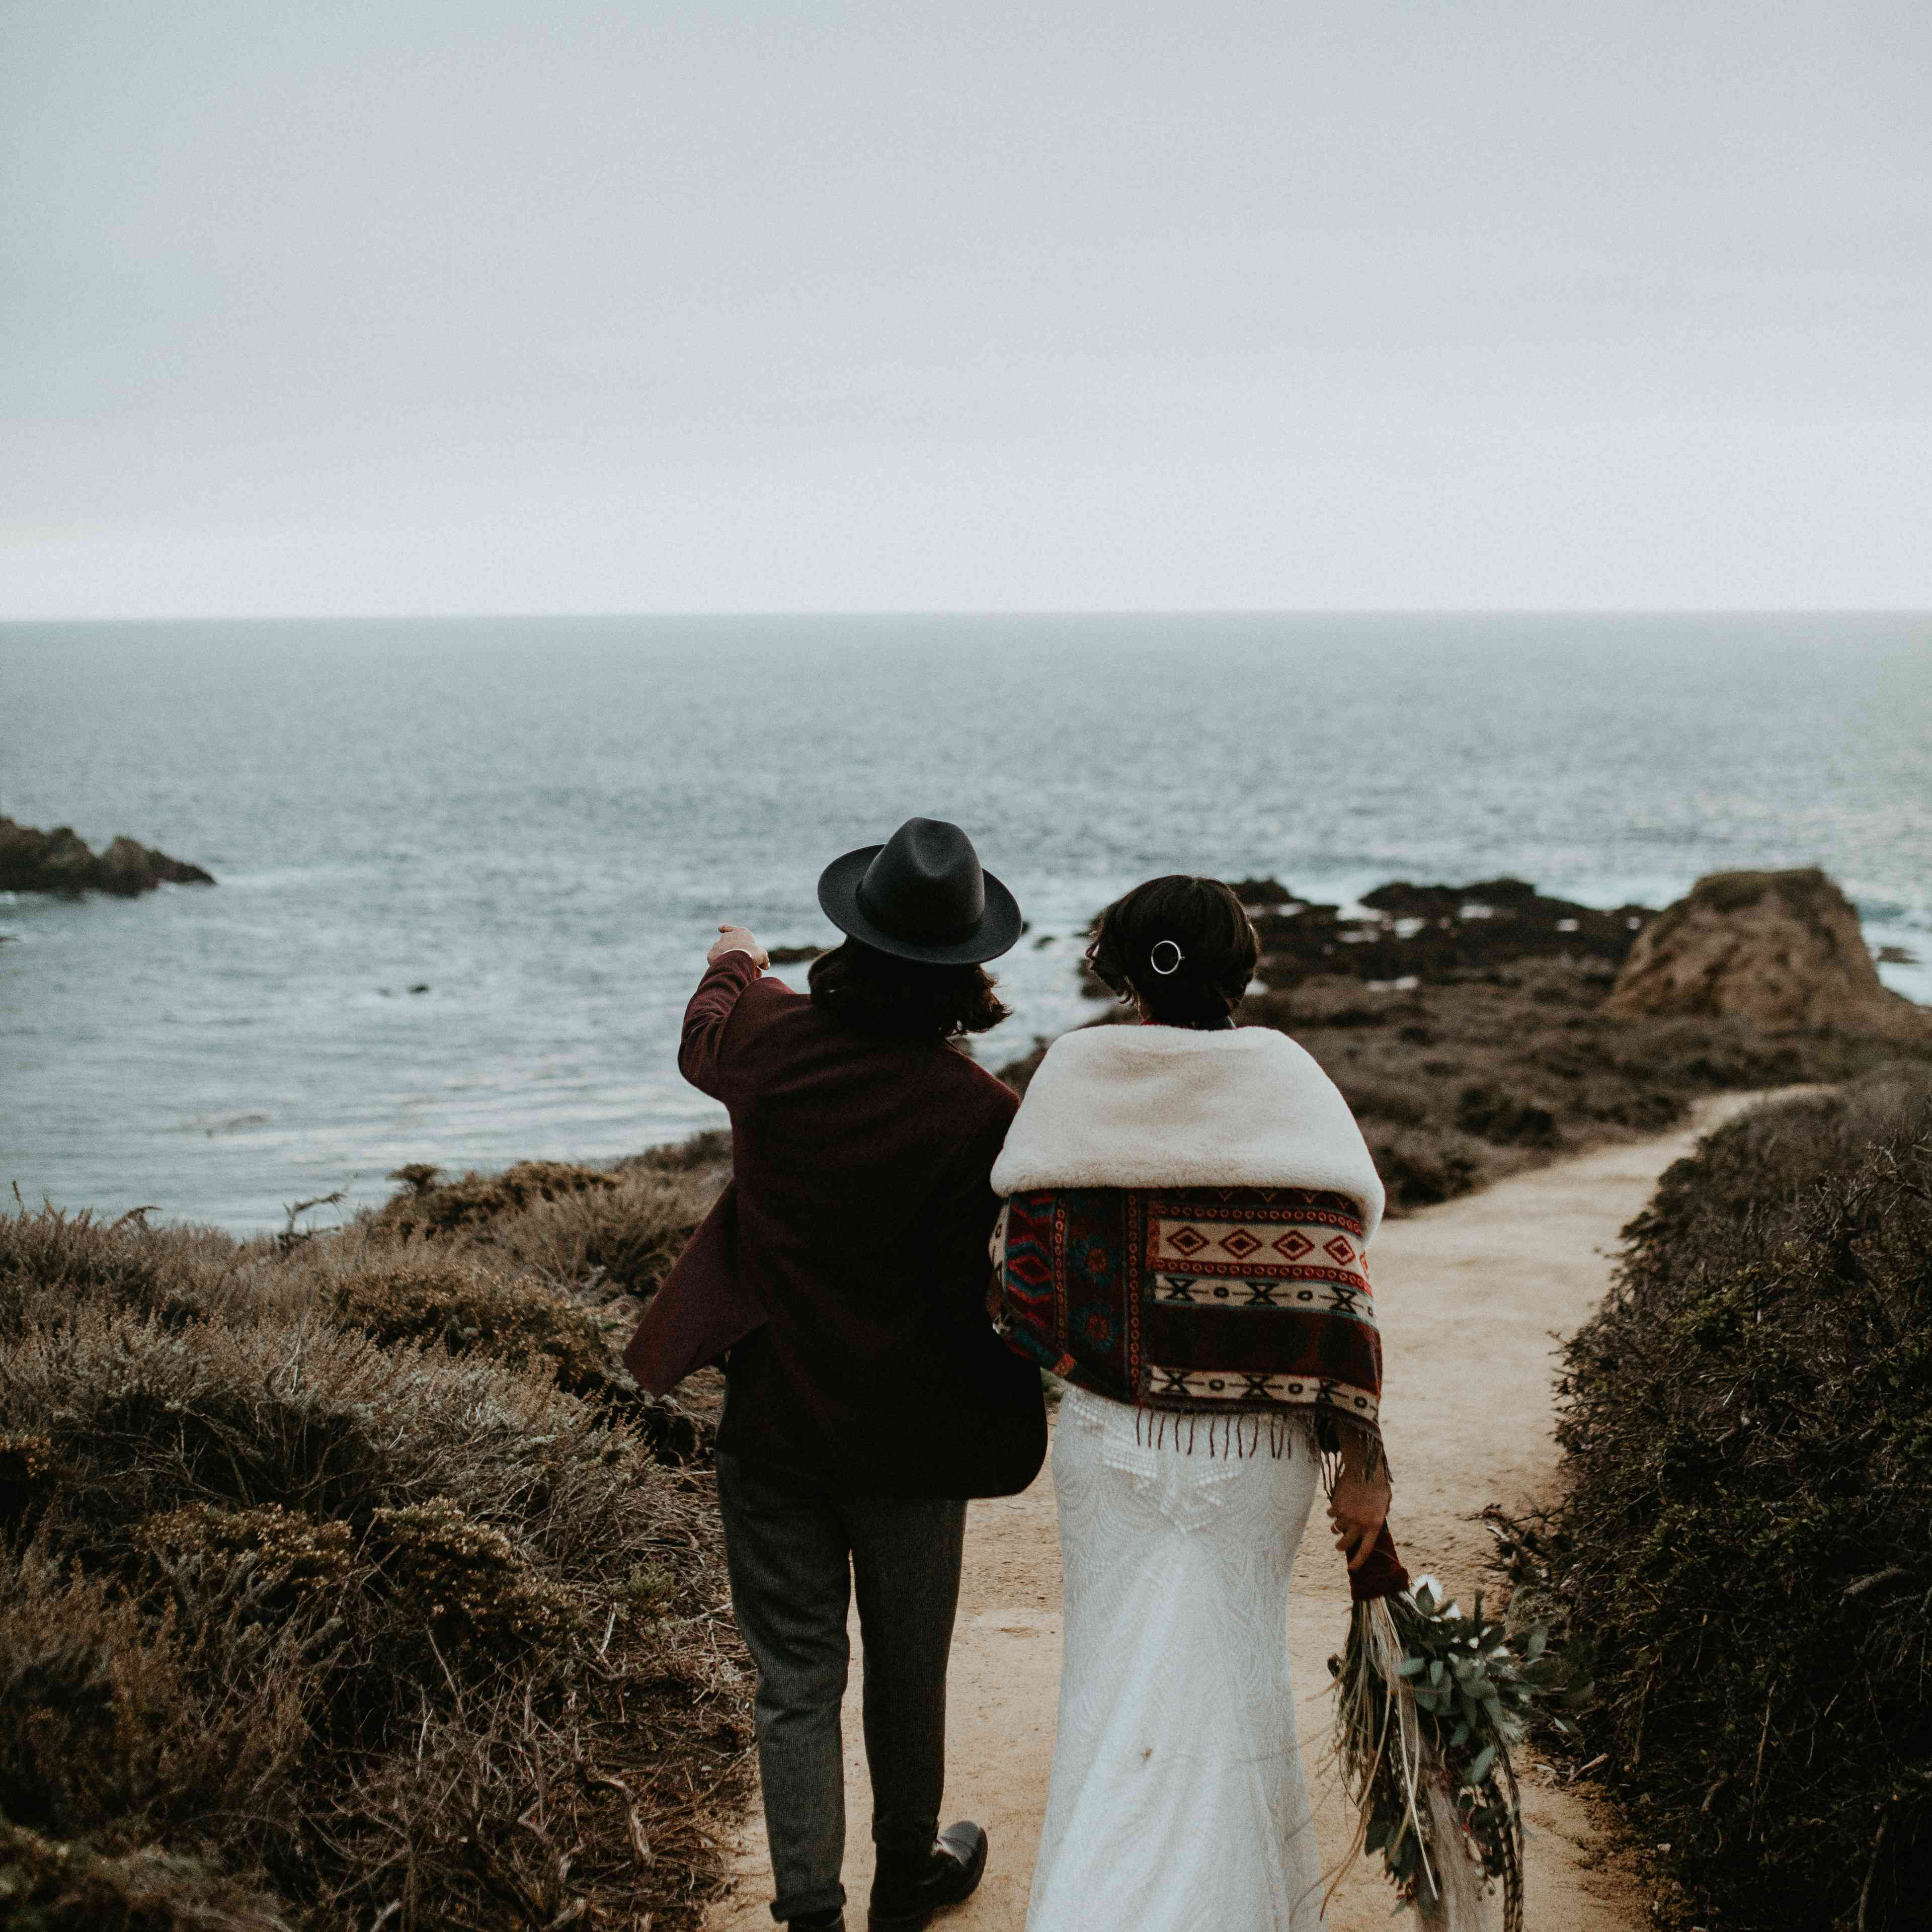 <p>bride in handmade blanket walking along the coast</p><br><br>